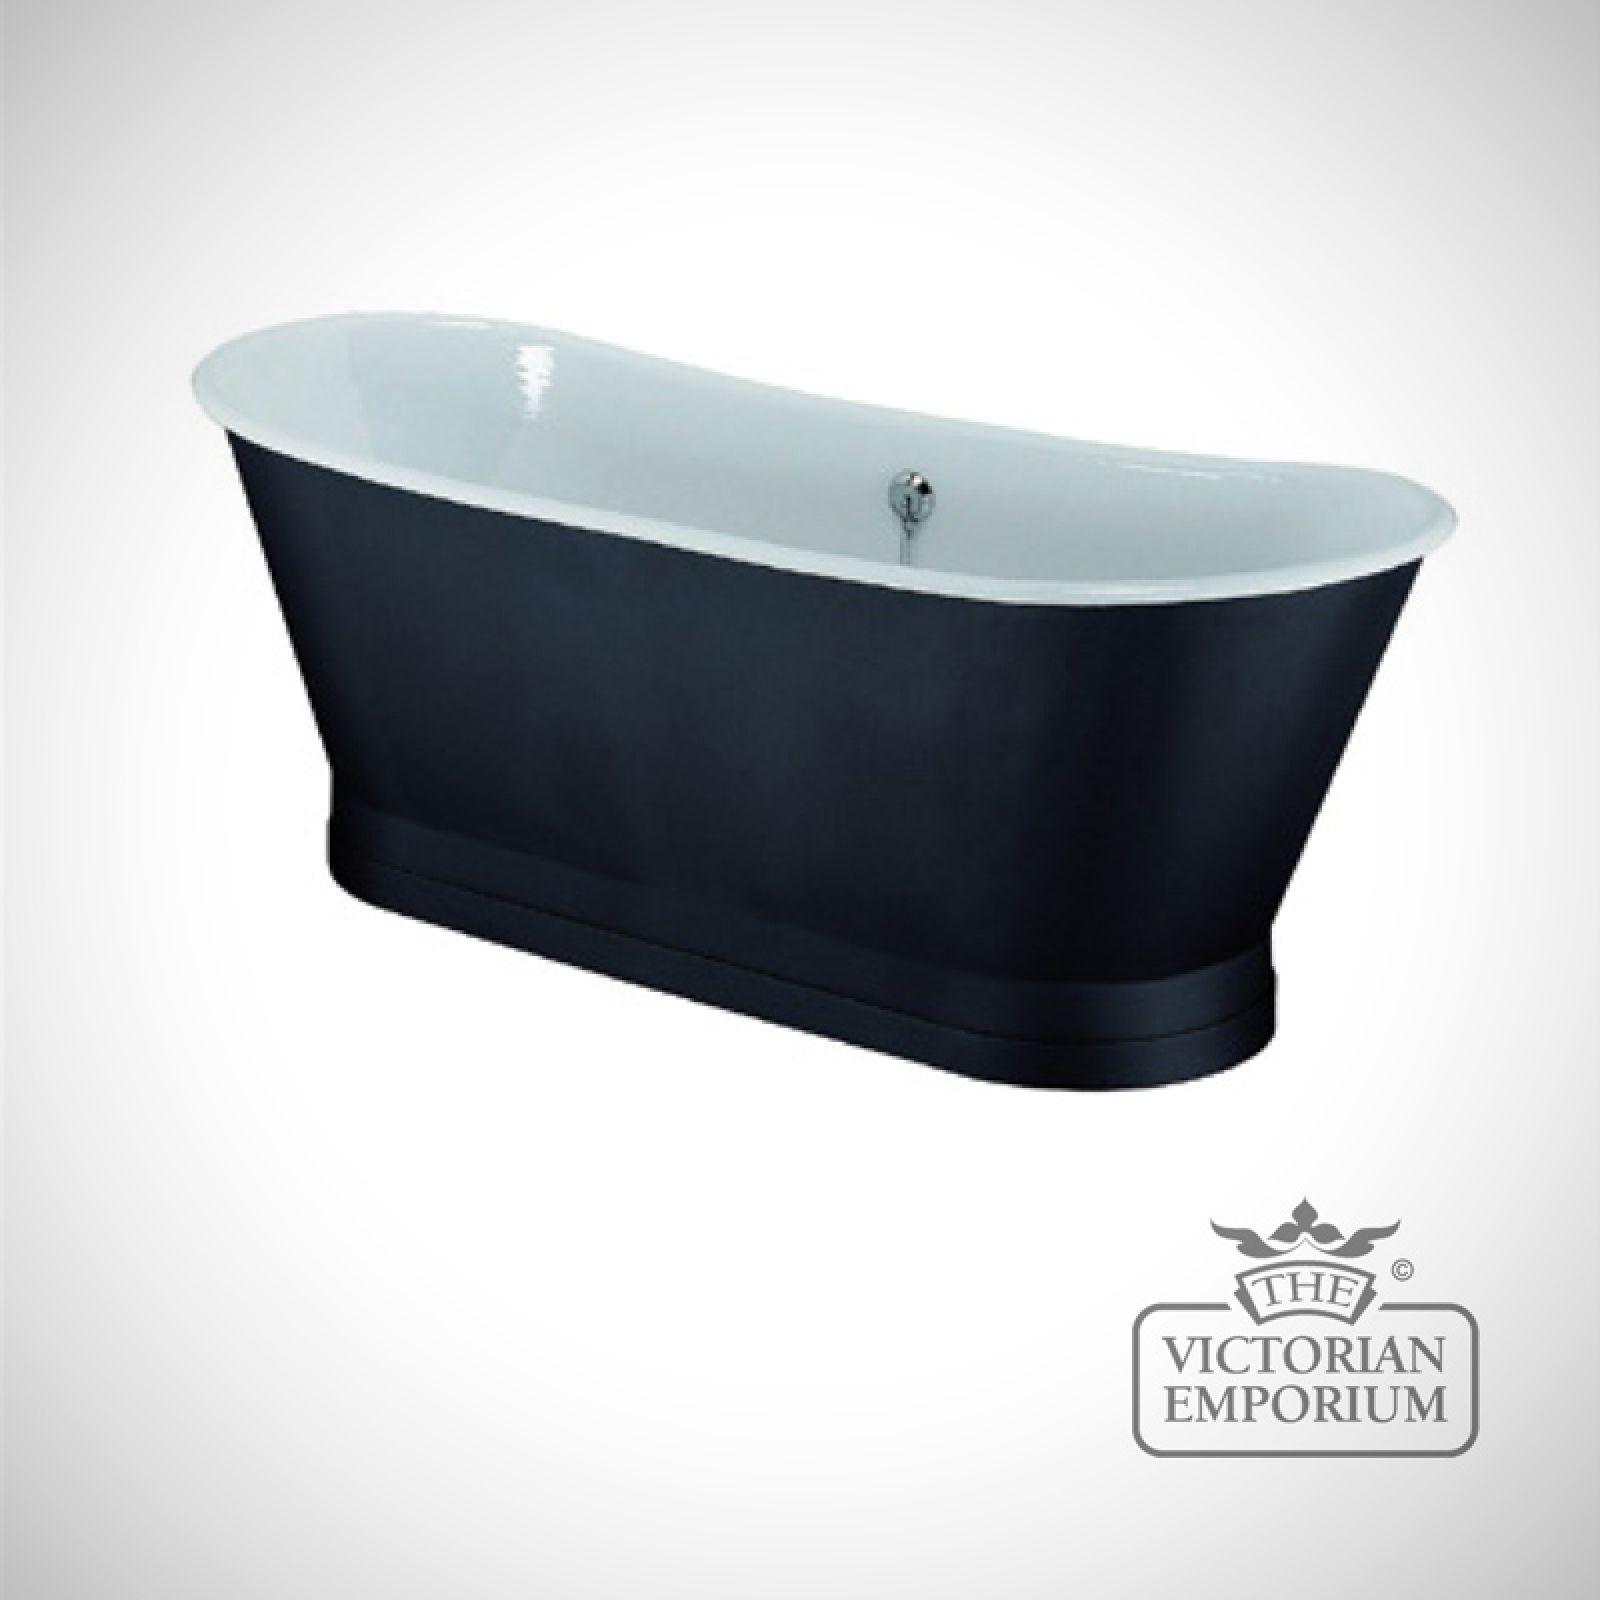 lorraine bath roll top baths the victorian emporium. Black Bedroom Furniture Sets. Home Design Ideas